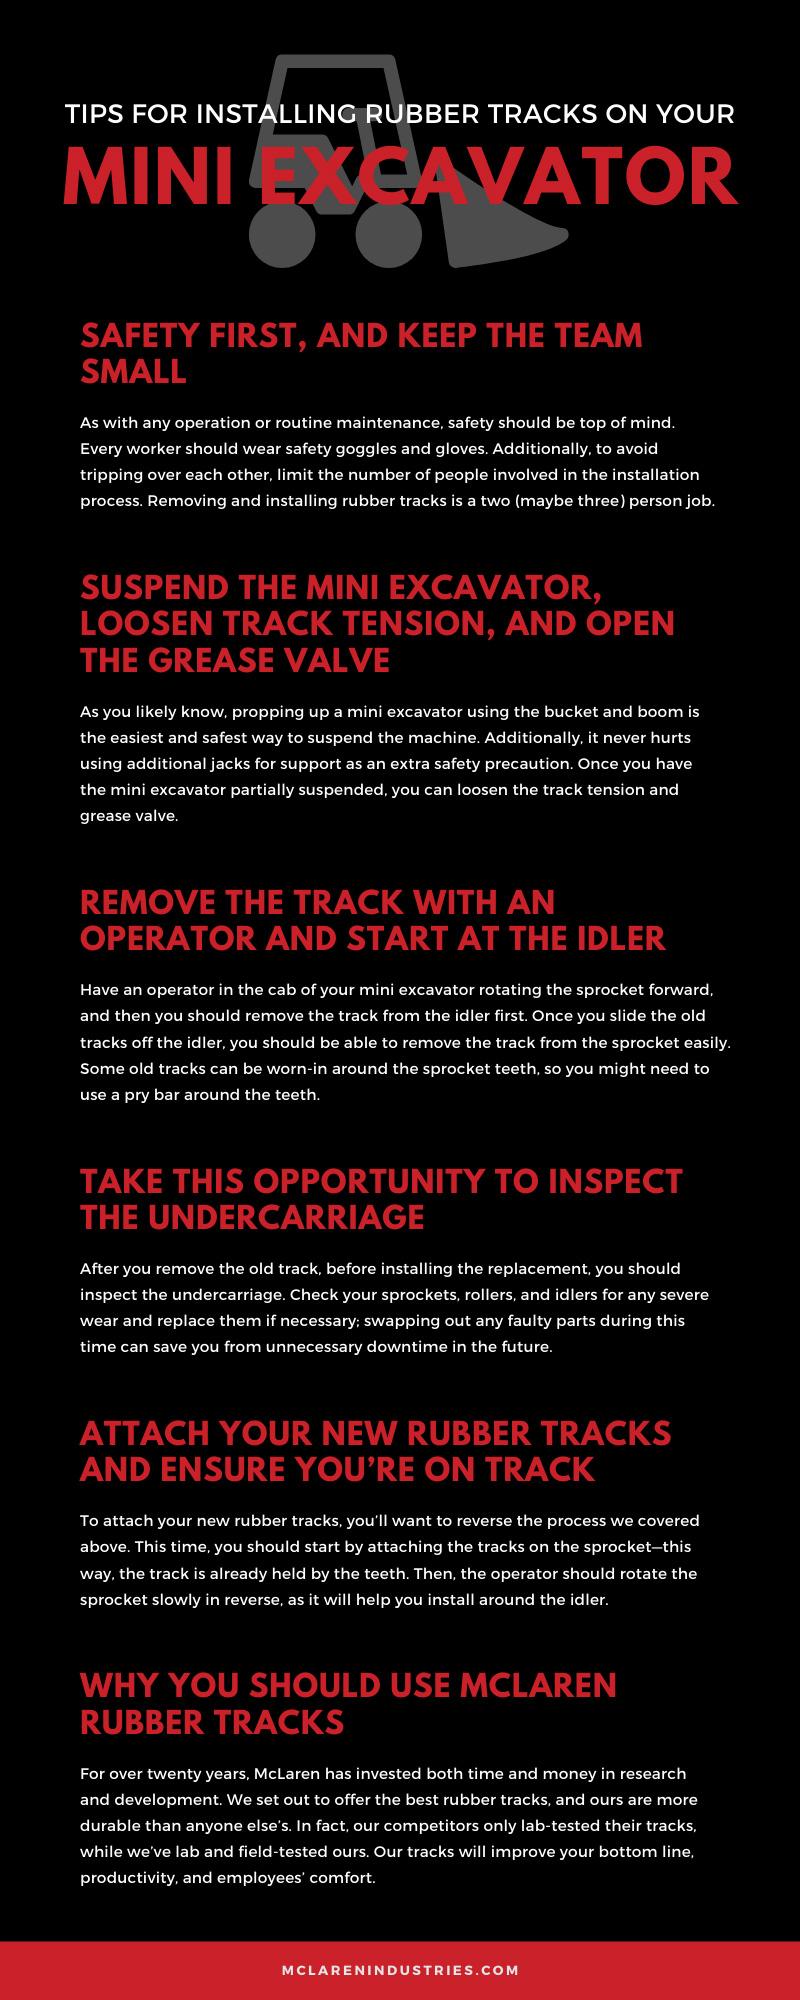 Installing Rubber Tracks Inforgraphic